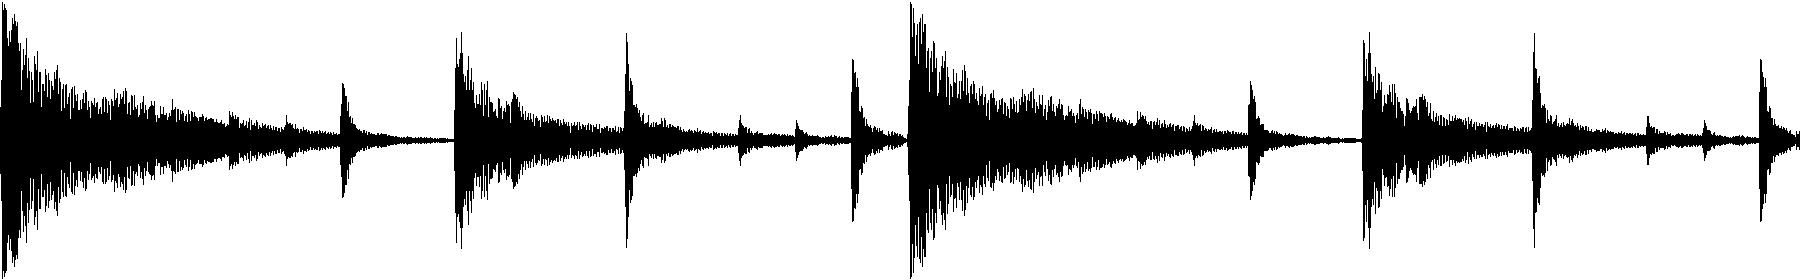 bluezone bc0210 percussion loop 024 110